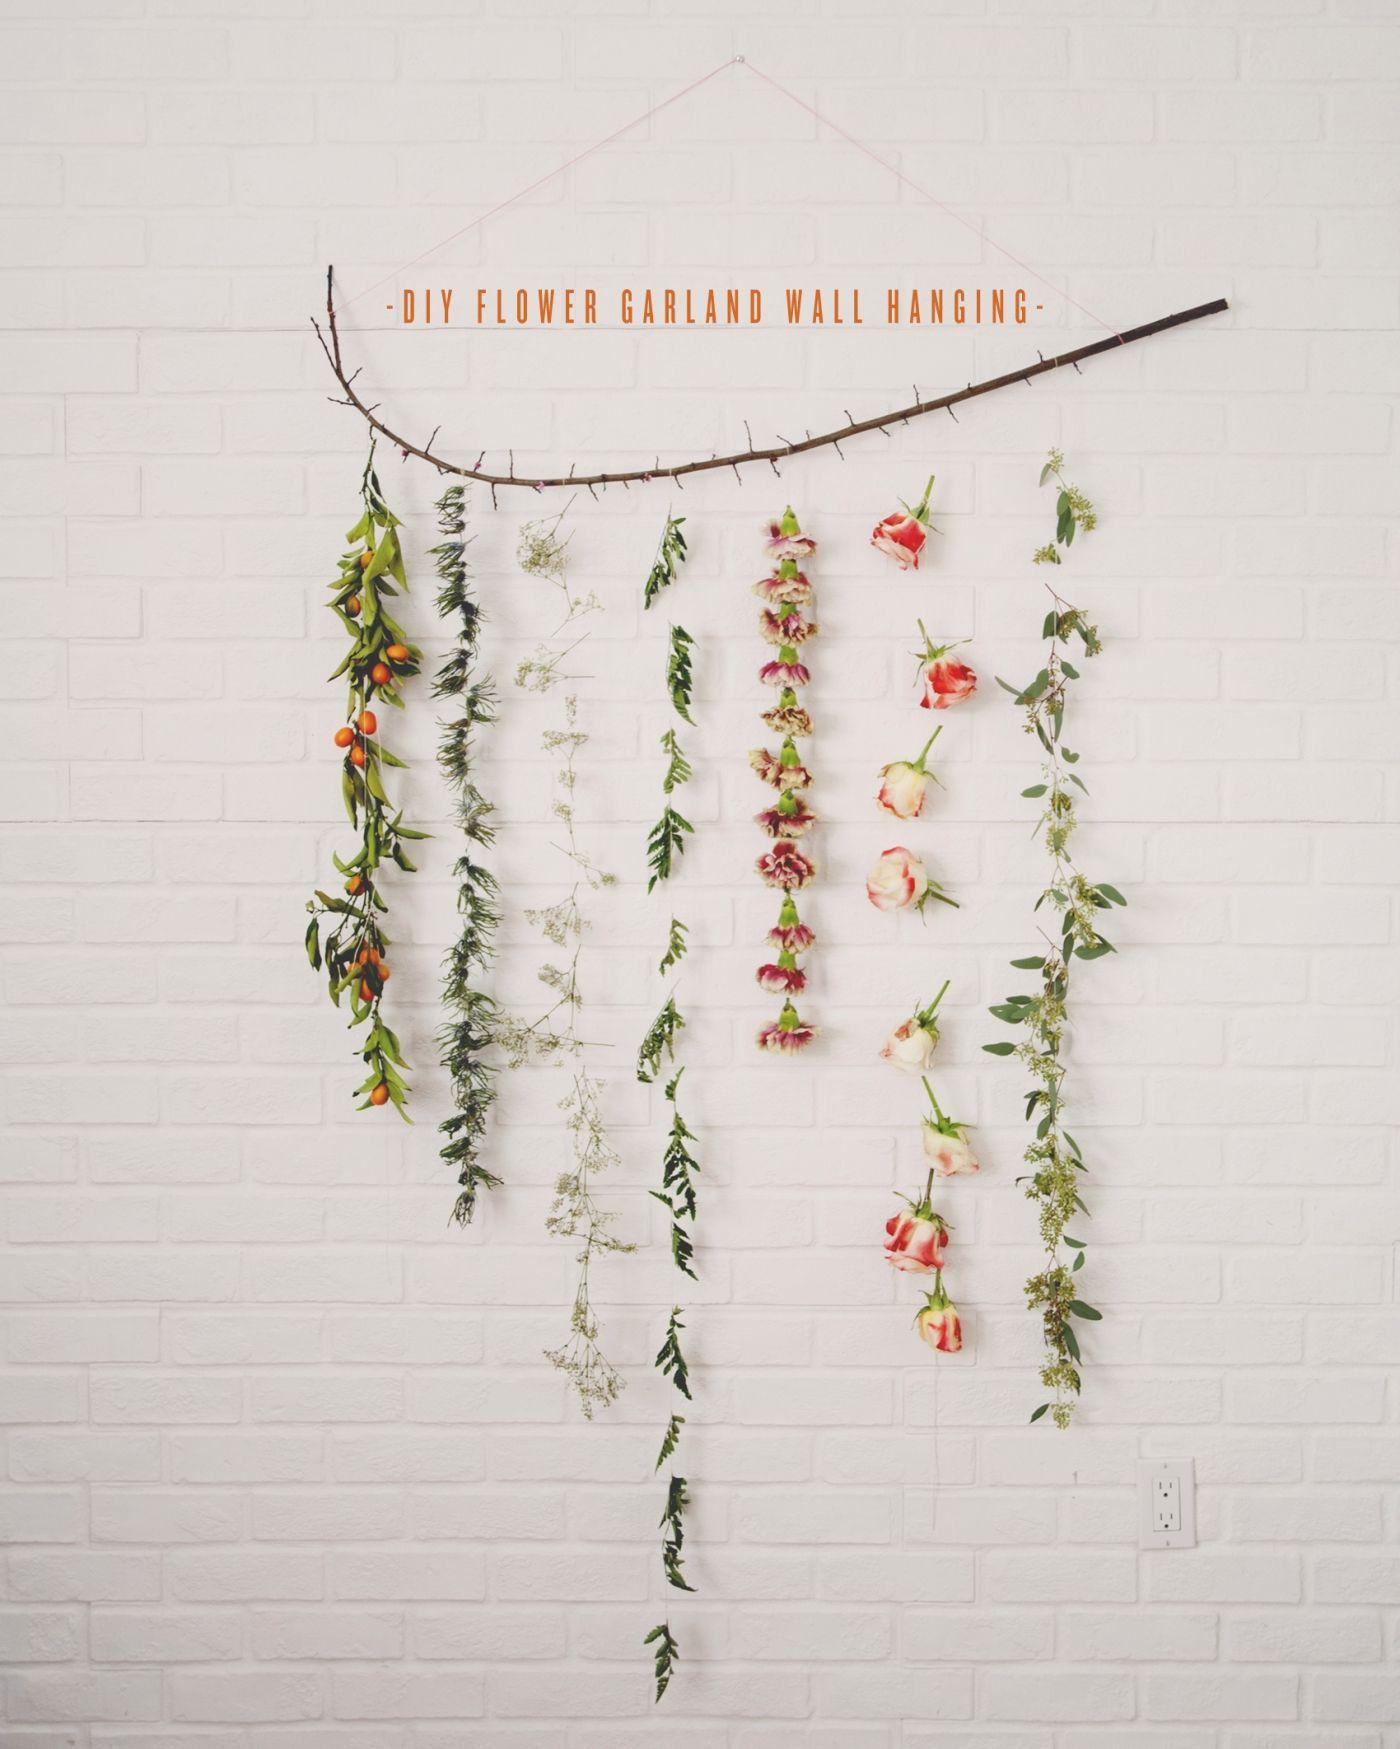 DIY FLOWER GARLAND WALL HANGING Diy garland, Diy flowers